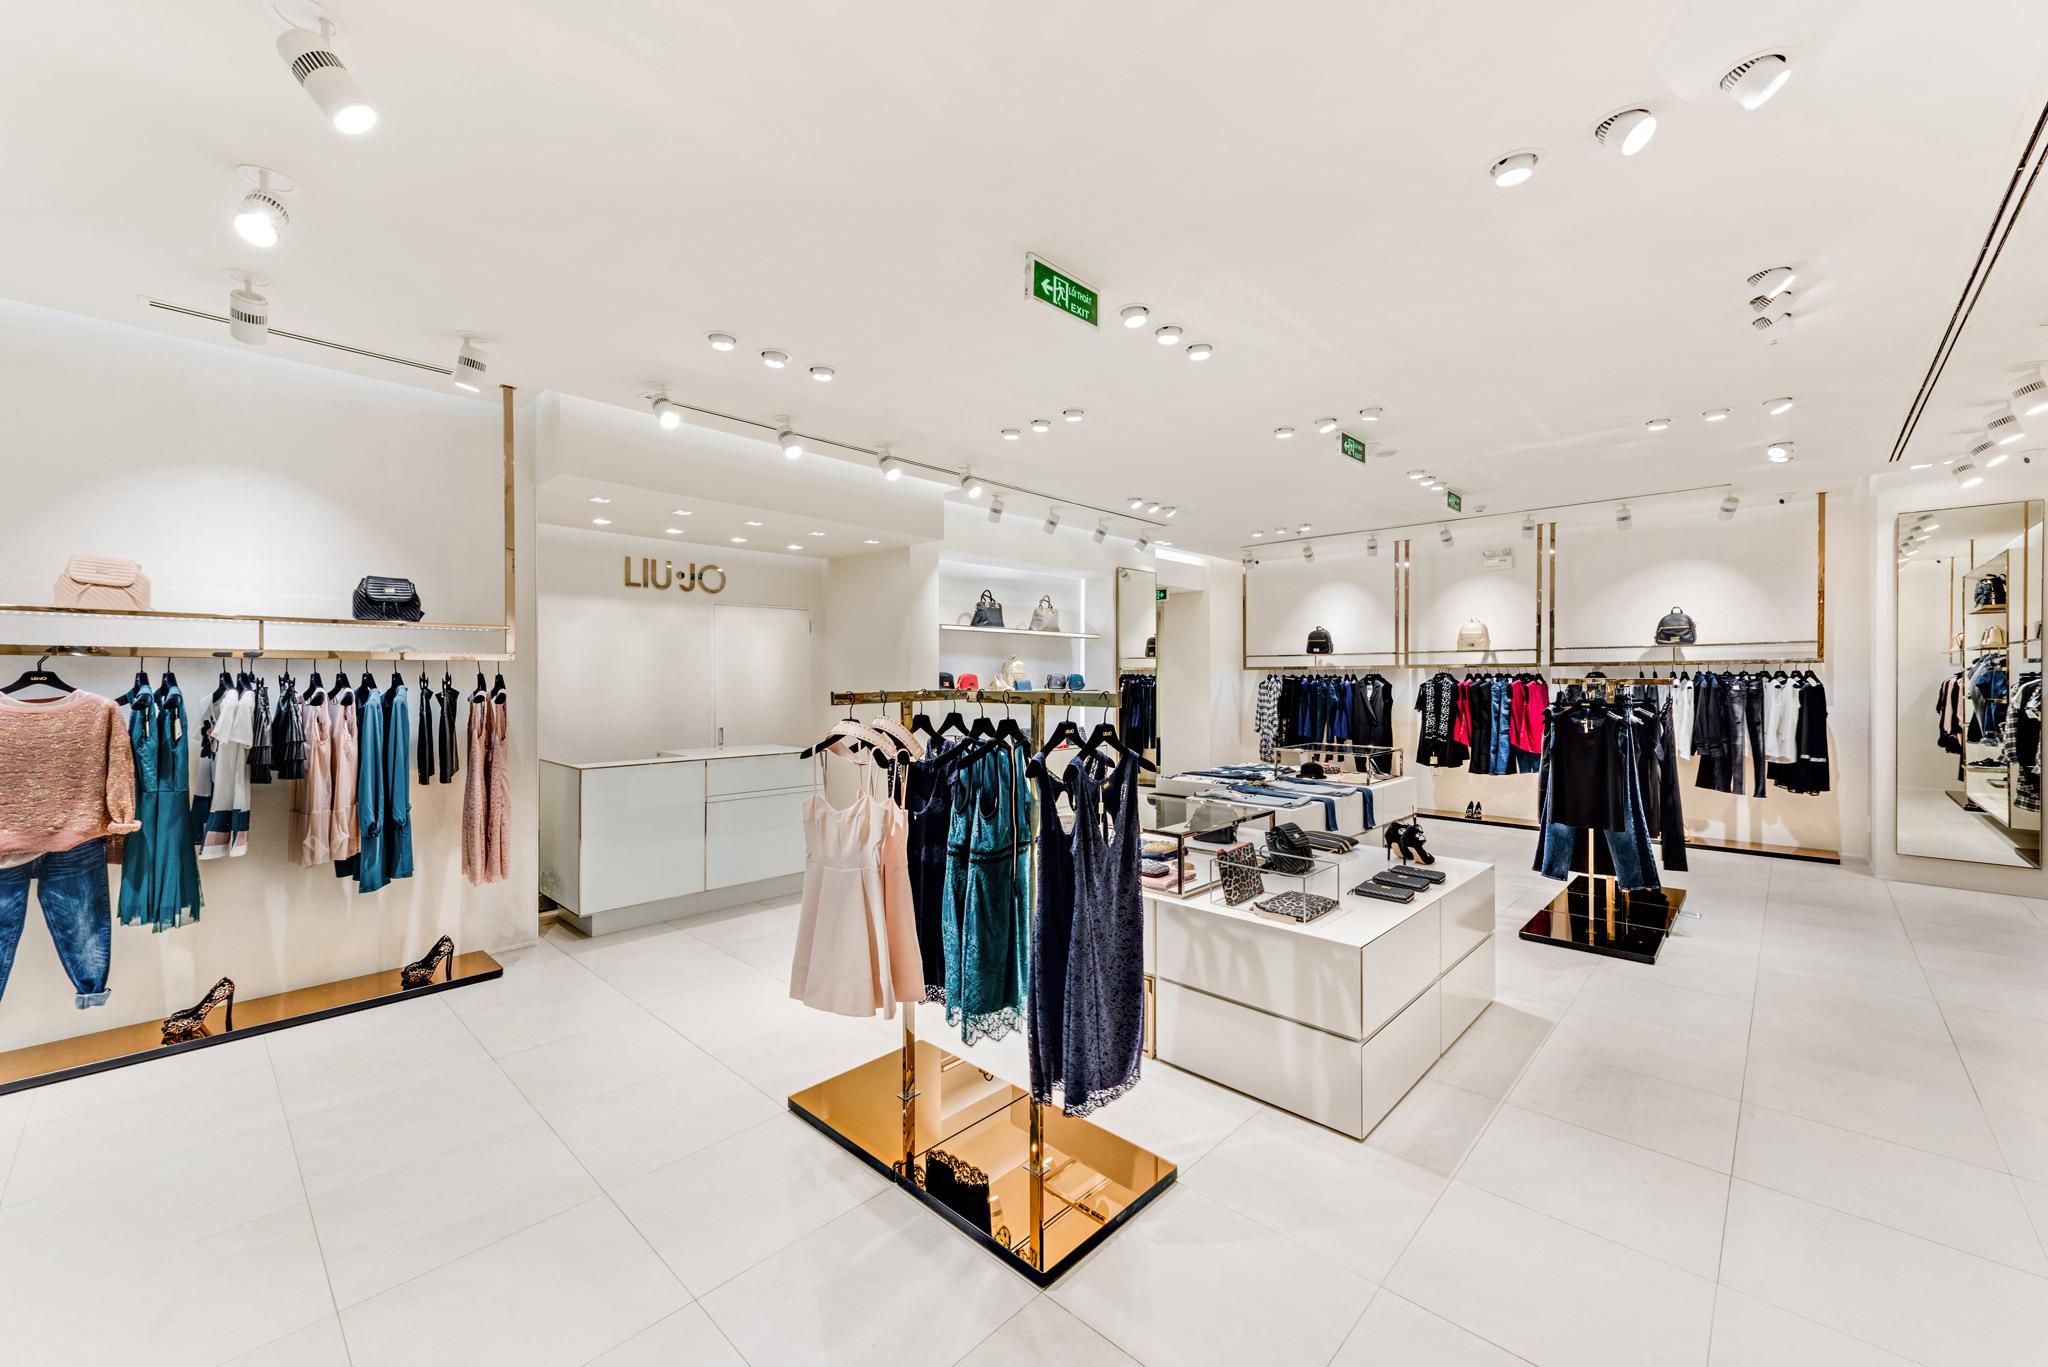 20160801 - Liu Jo - HCM - Commercial - Interior - Store - Retouch 0002.jpg